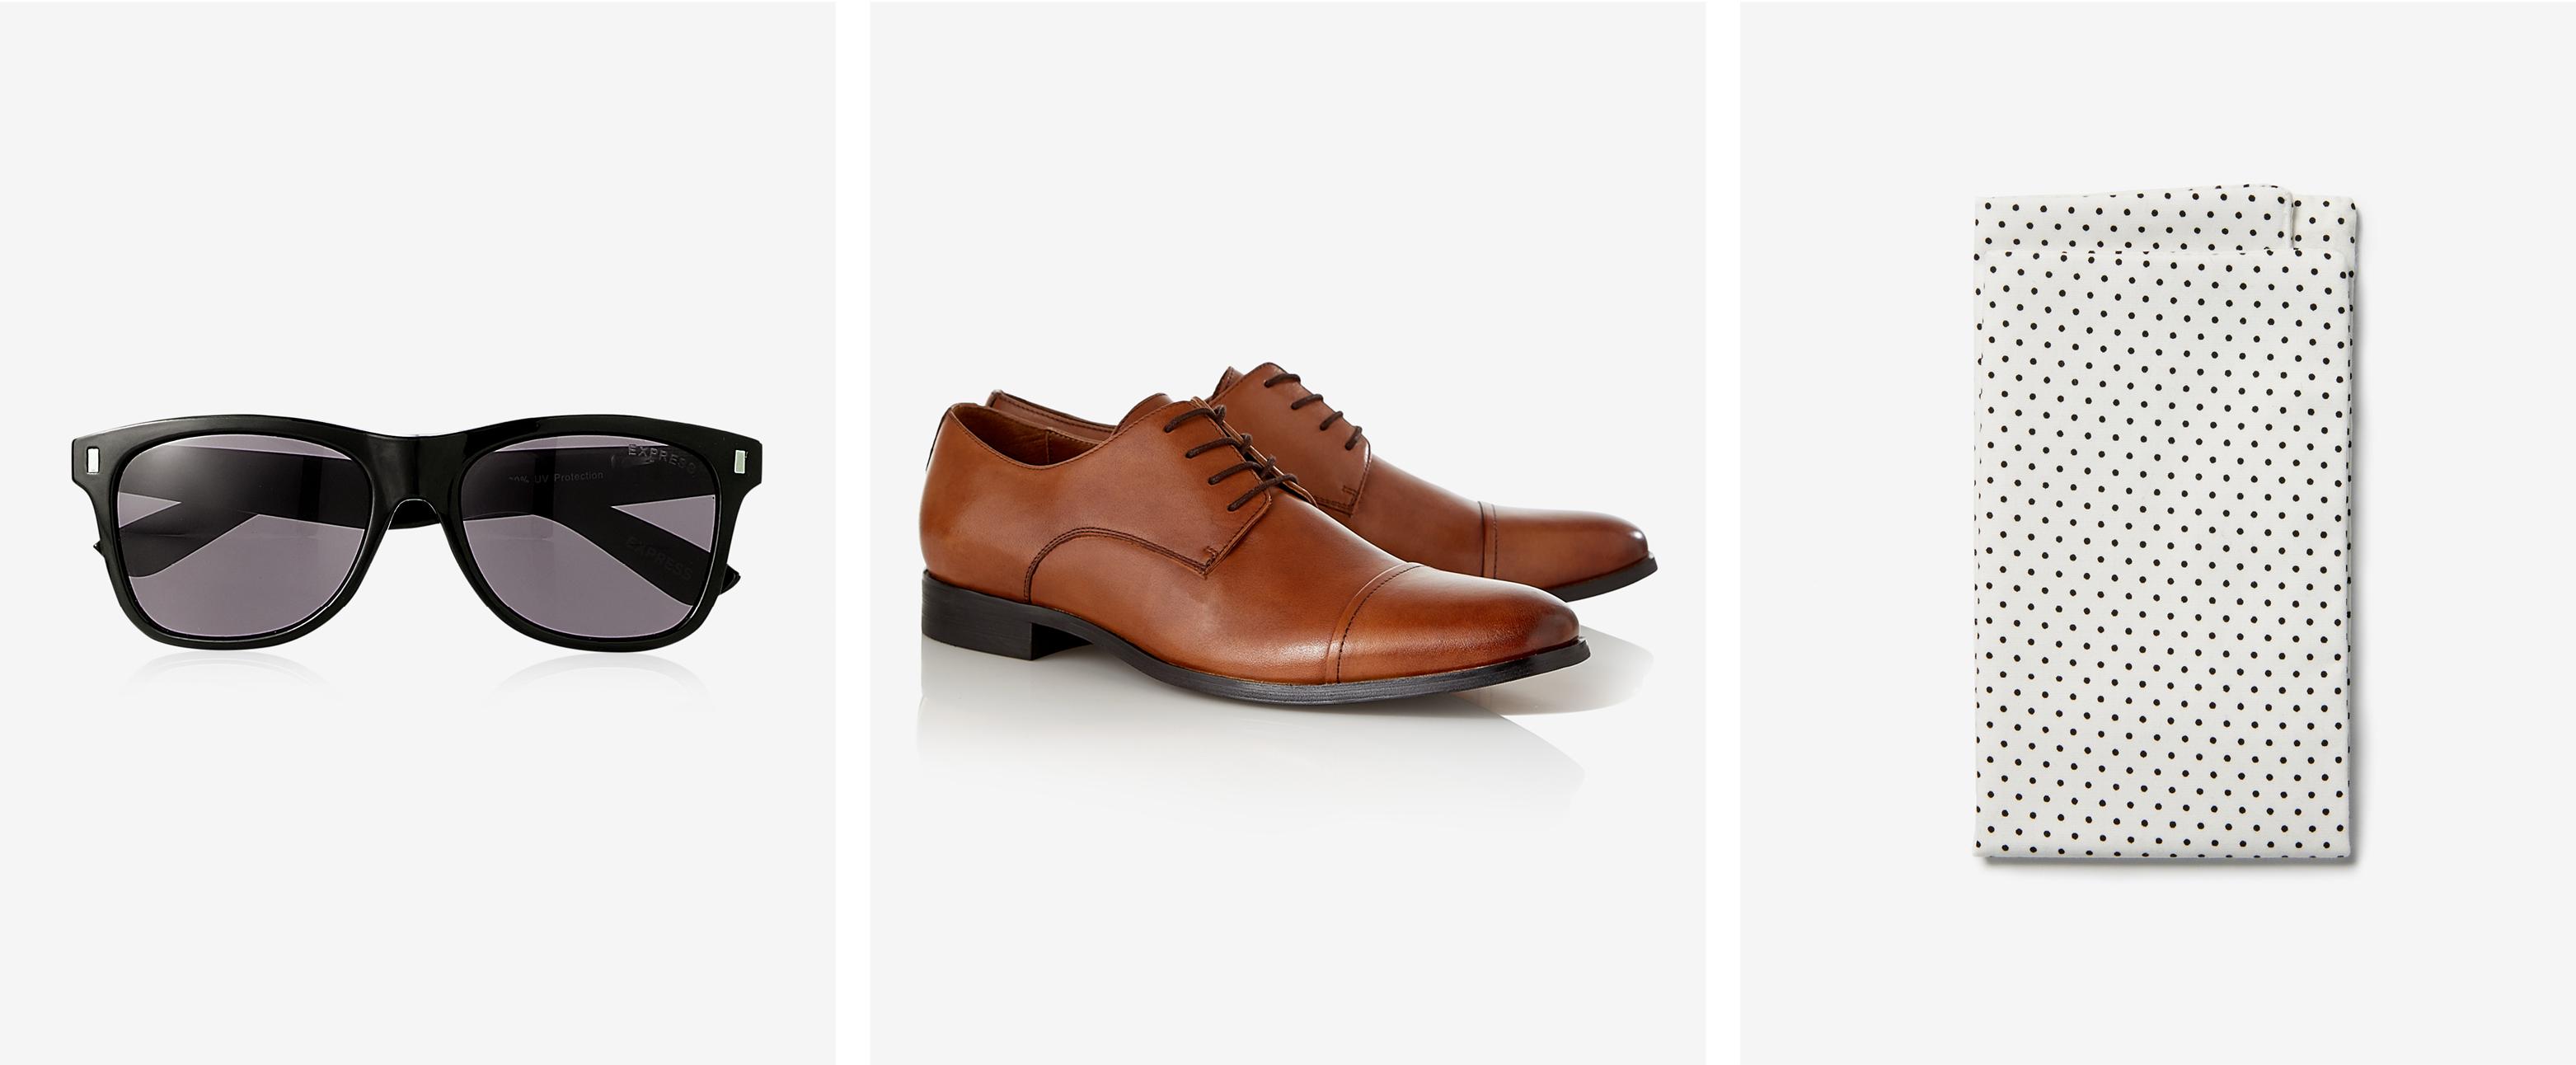 mens-sunglasses-dress-shoes-pocket-square